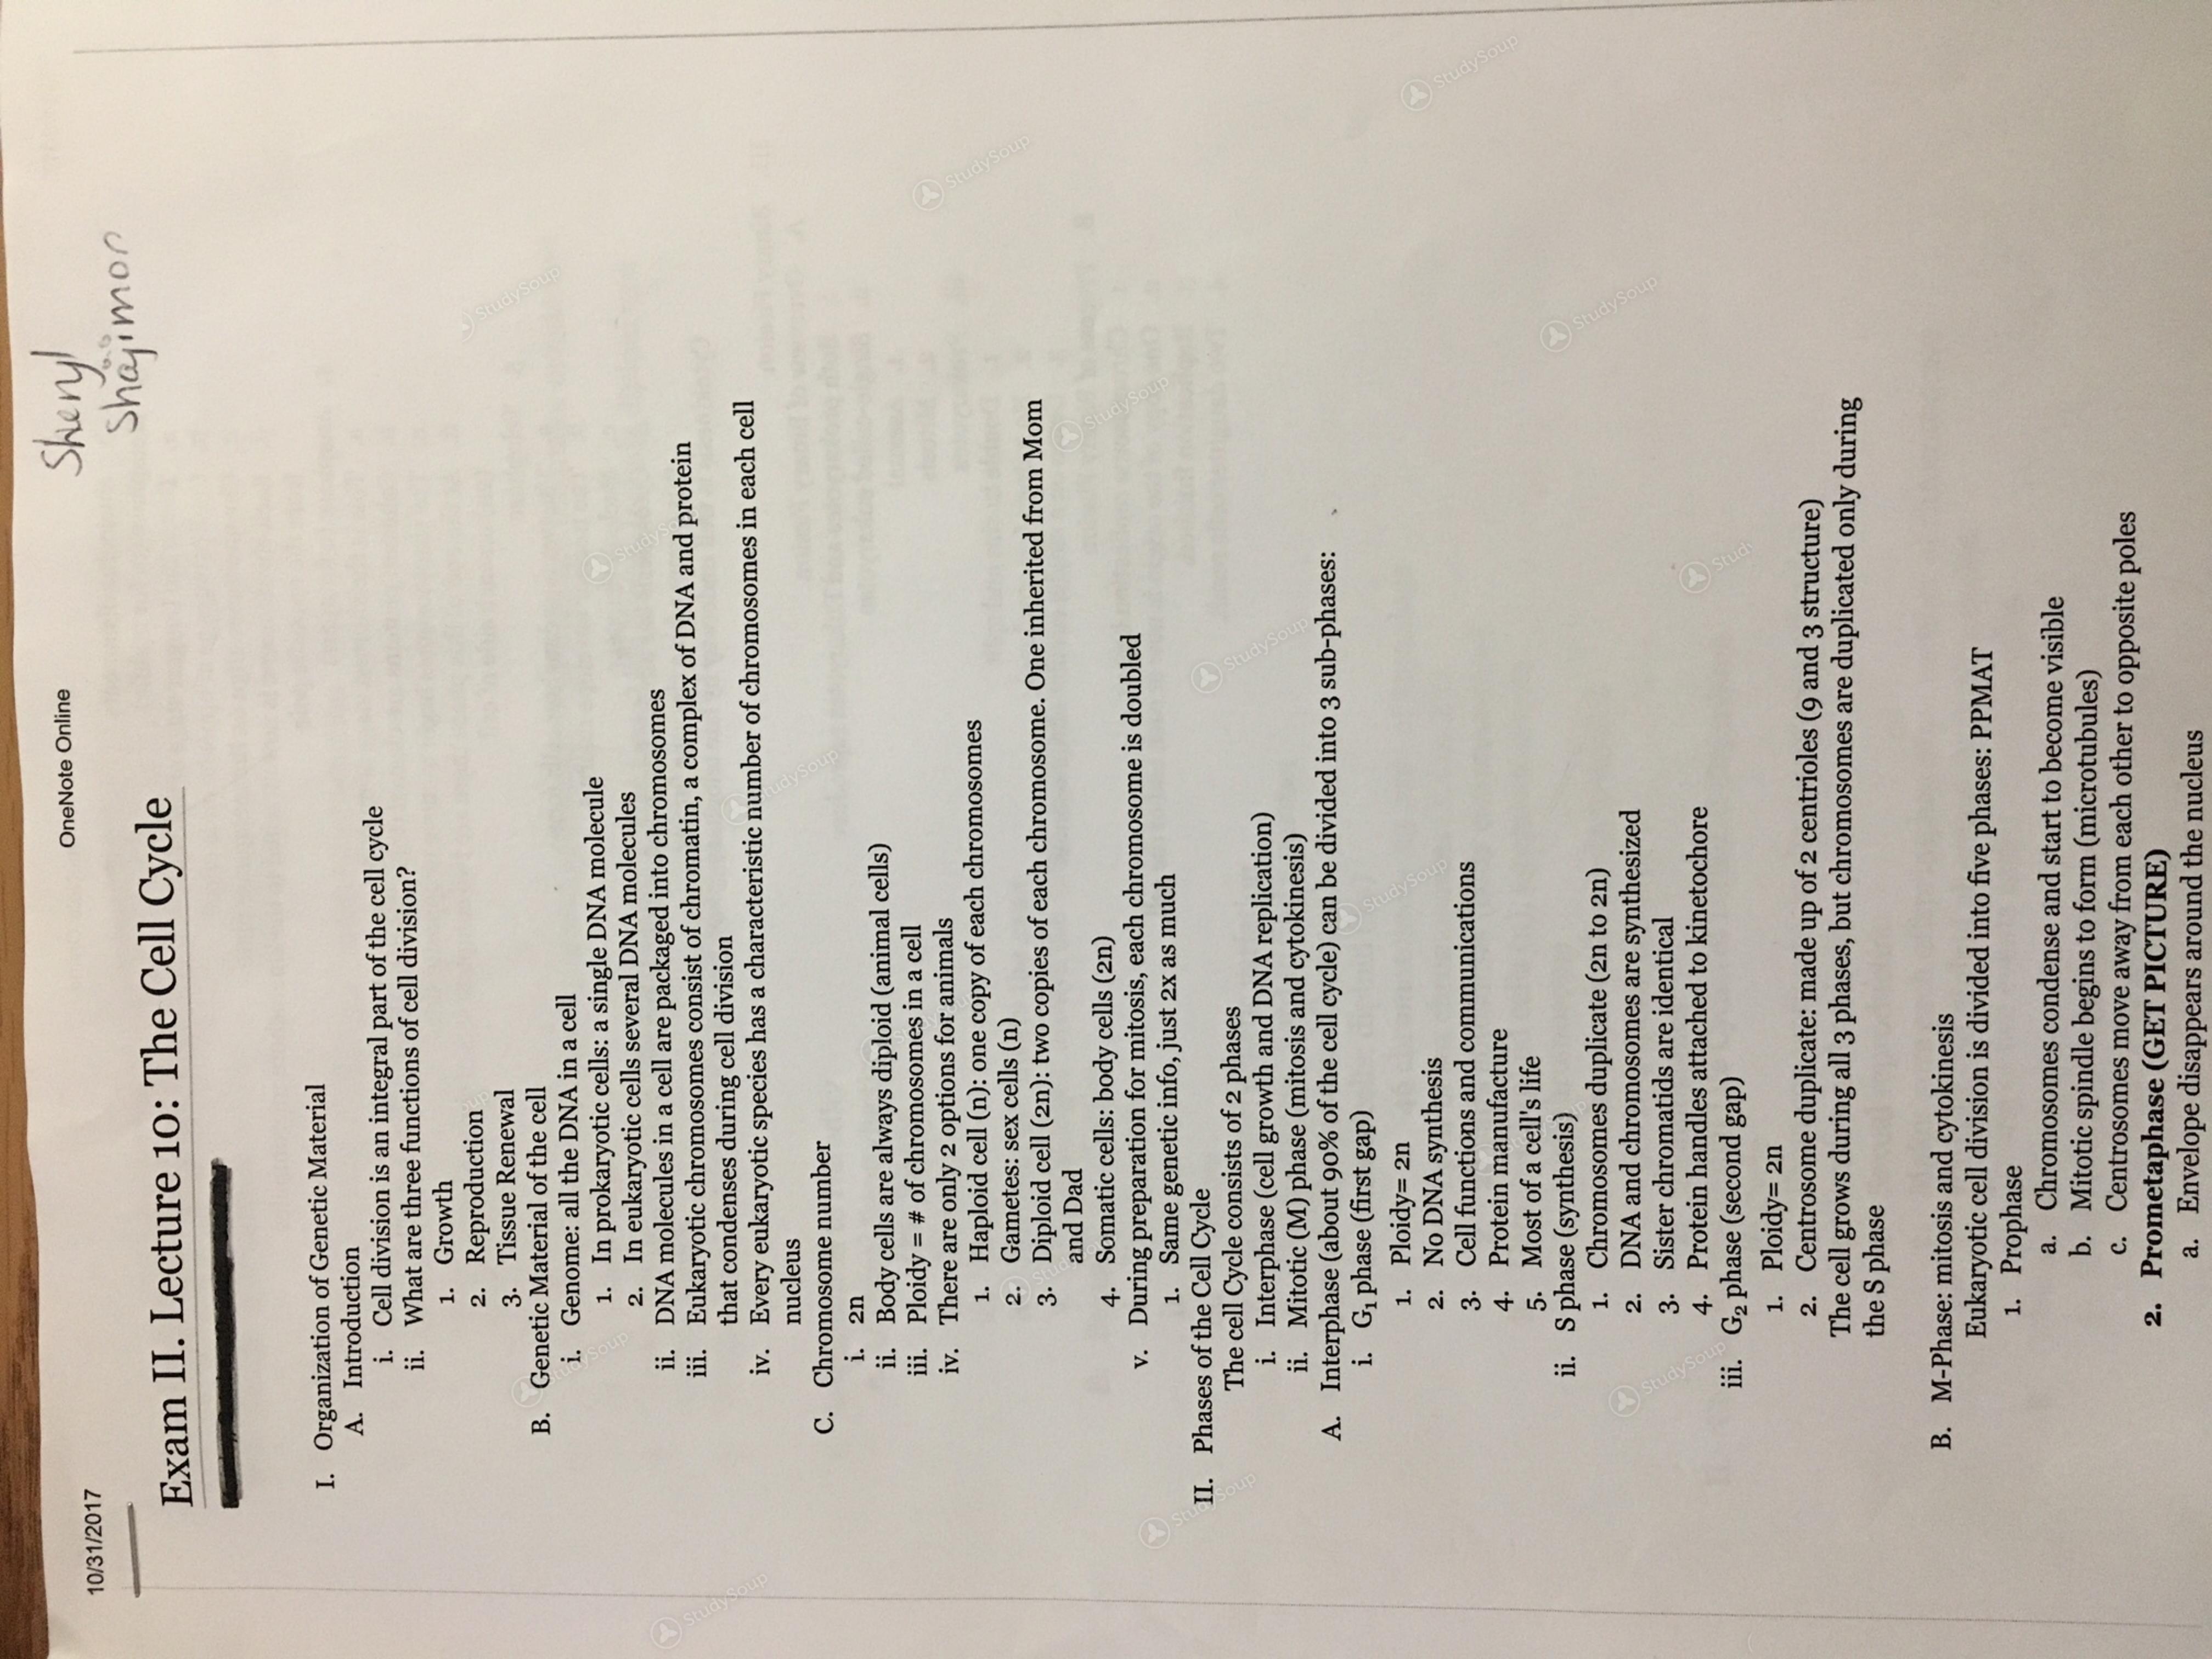 Rutgers - BIOL 119 - Biology Exam 2 Notes - Study Guide | StudySoup